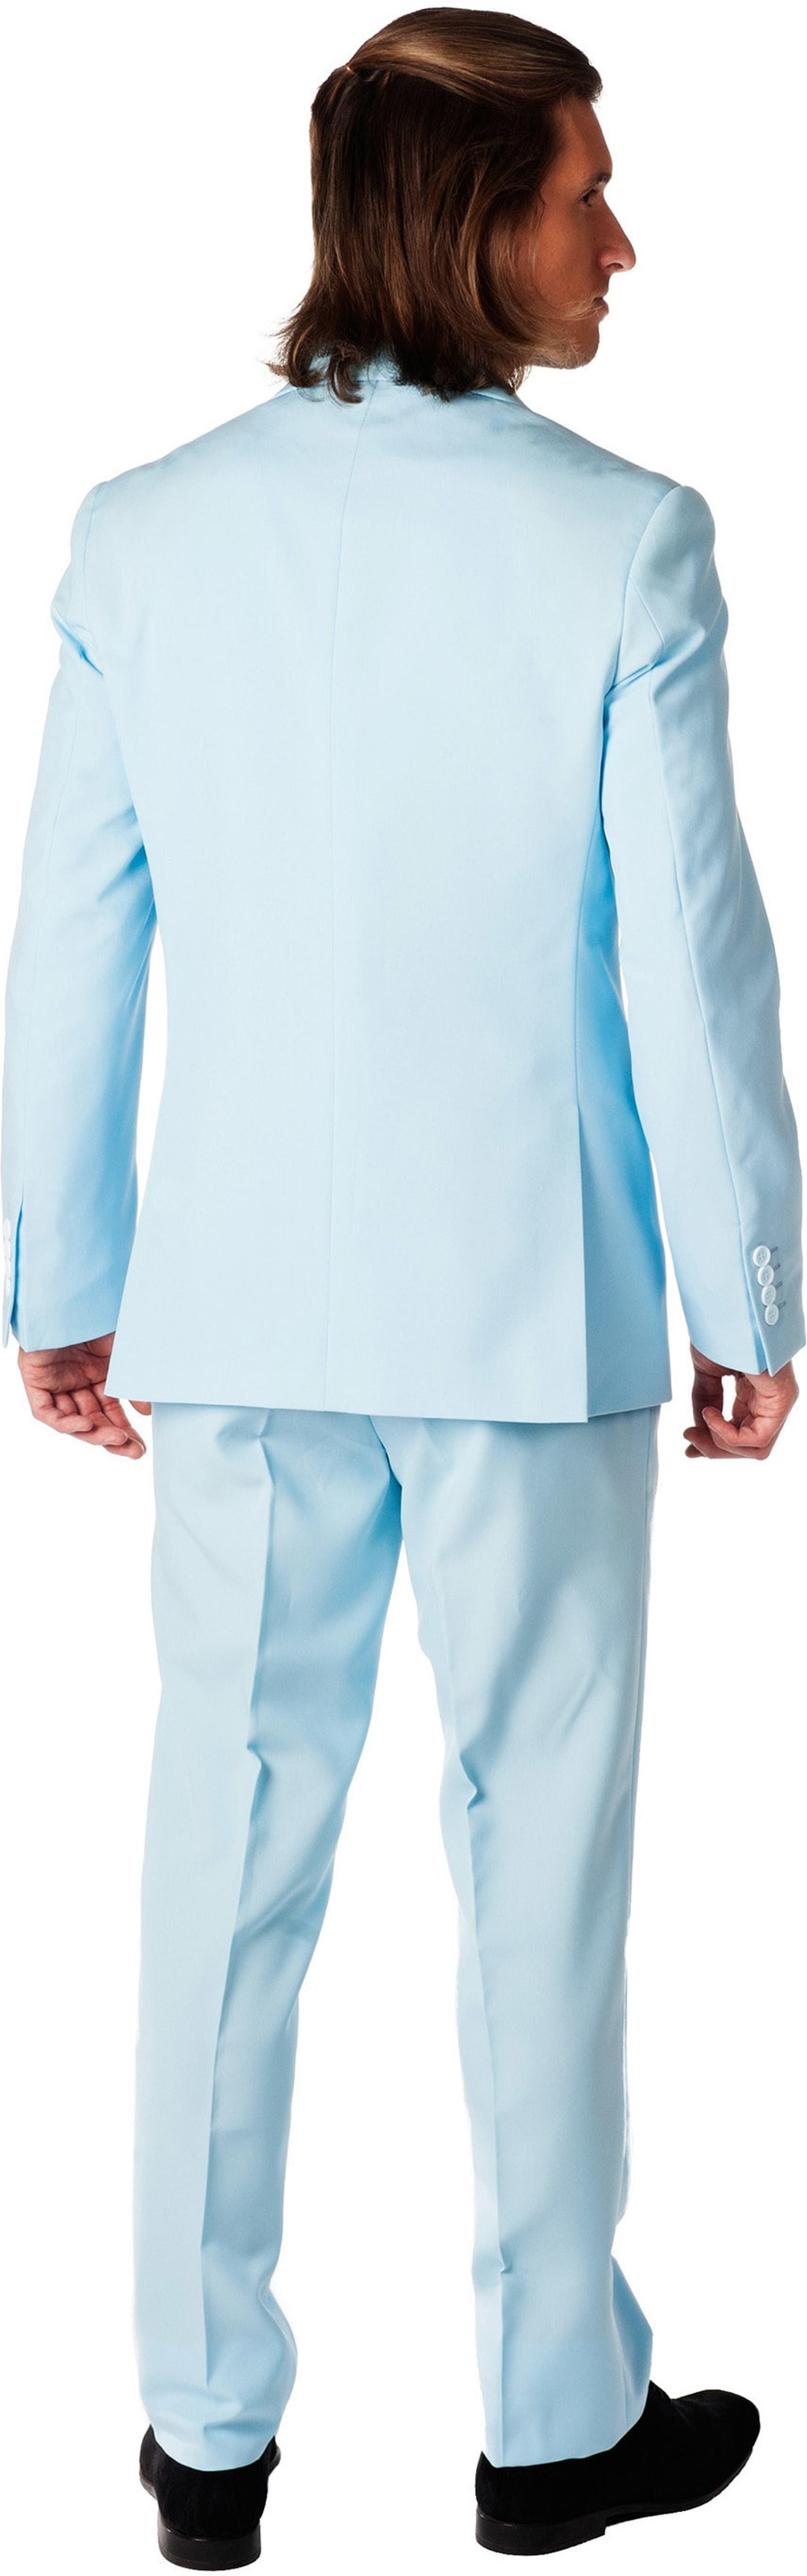 OppoSuits Cool Blue Kostuum foto 1